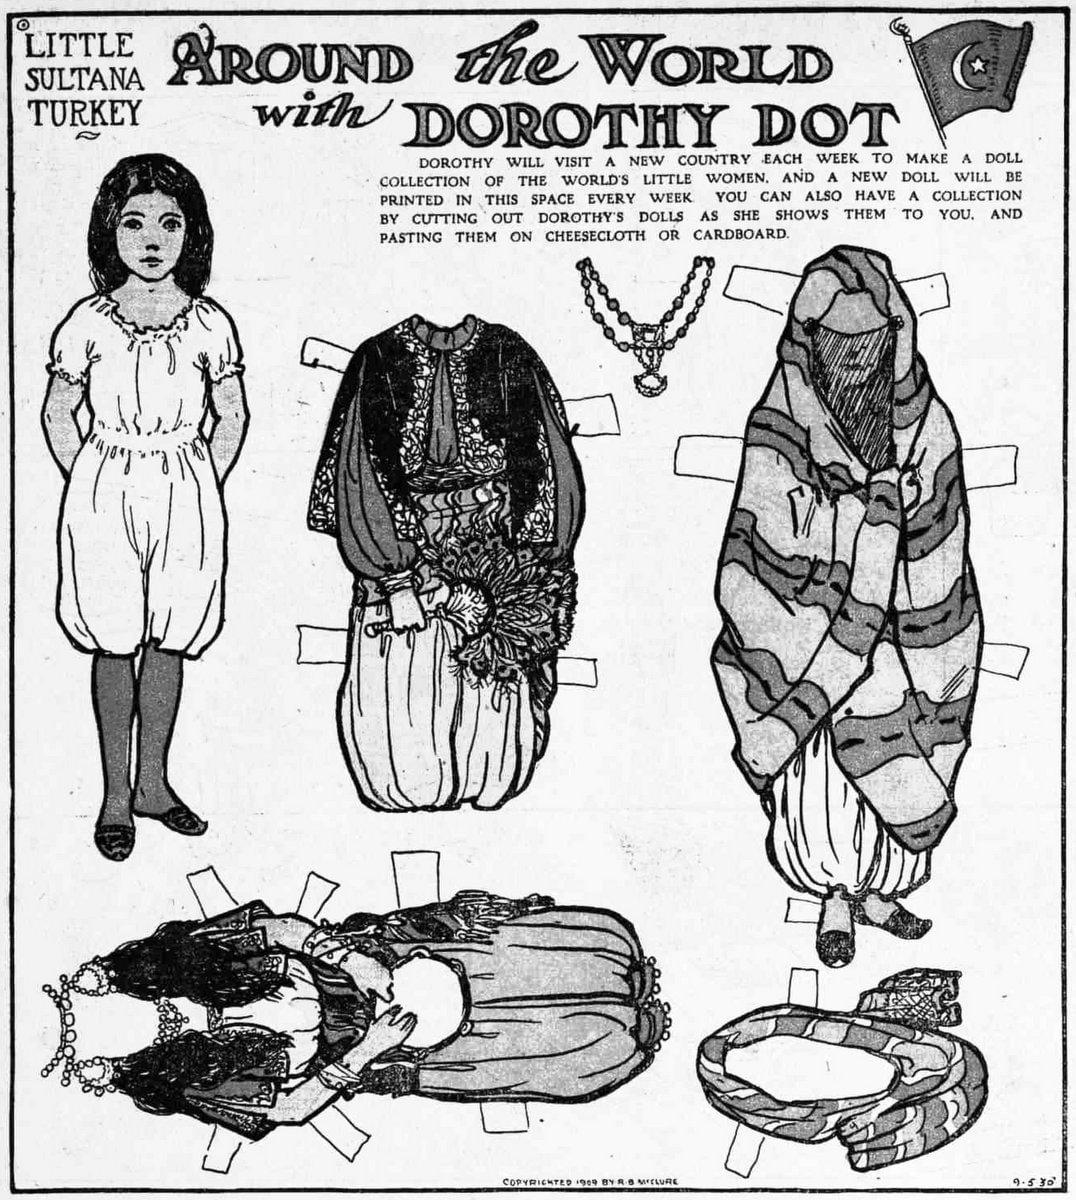 Dorothy Dot paper doll: Little Sultana of Turkey (1909)